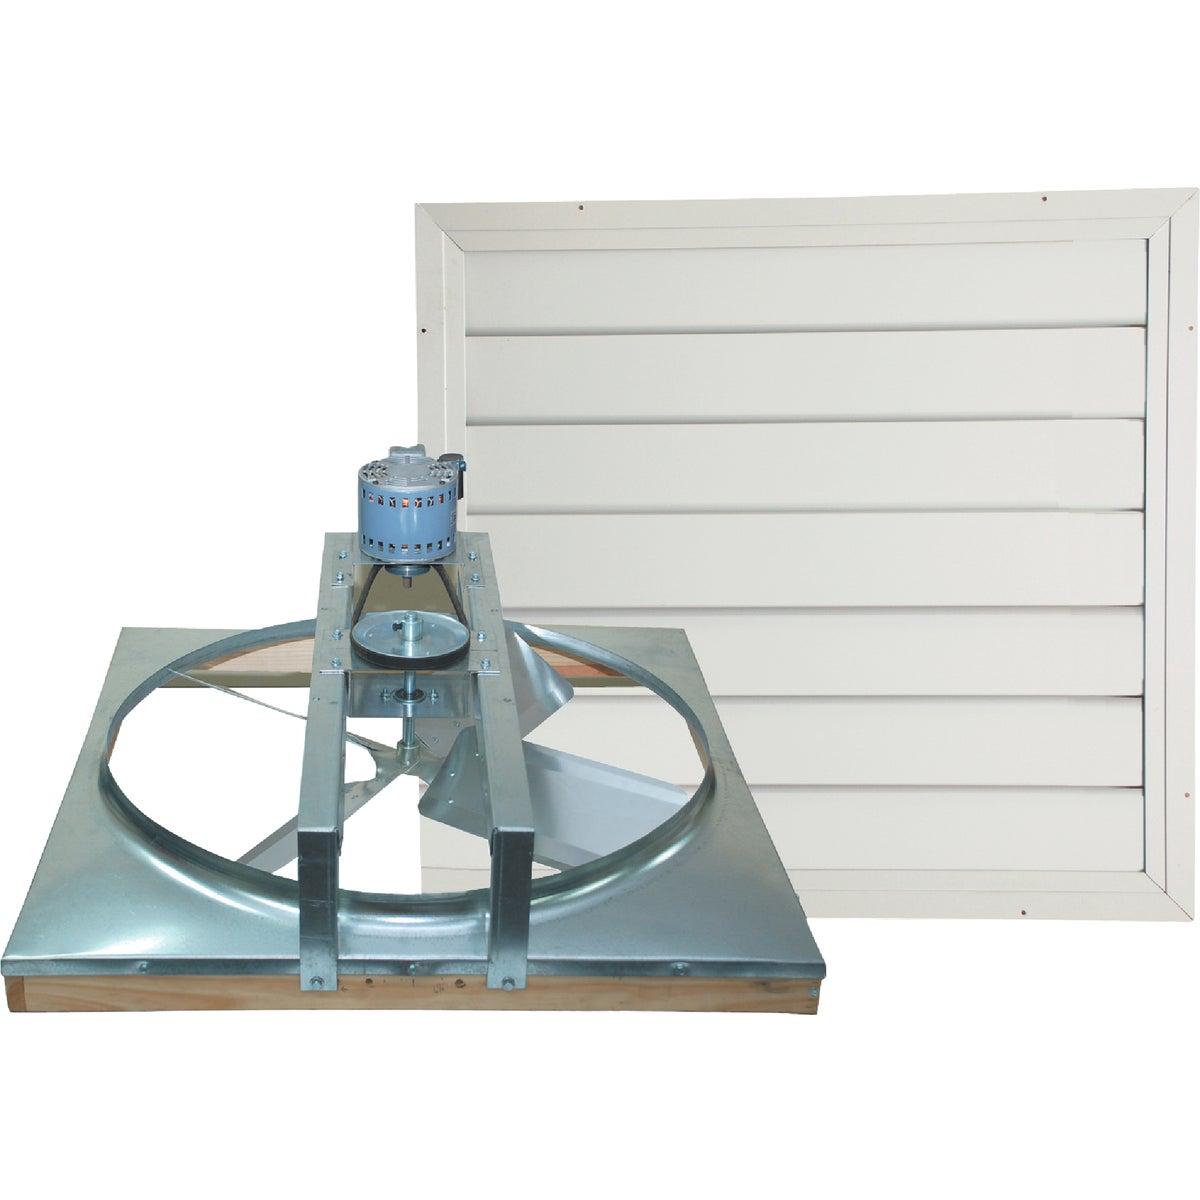 Ventamatic Belt Drive Whole House Fan With Automatic Shutter, CX24BD2SPD